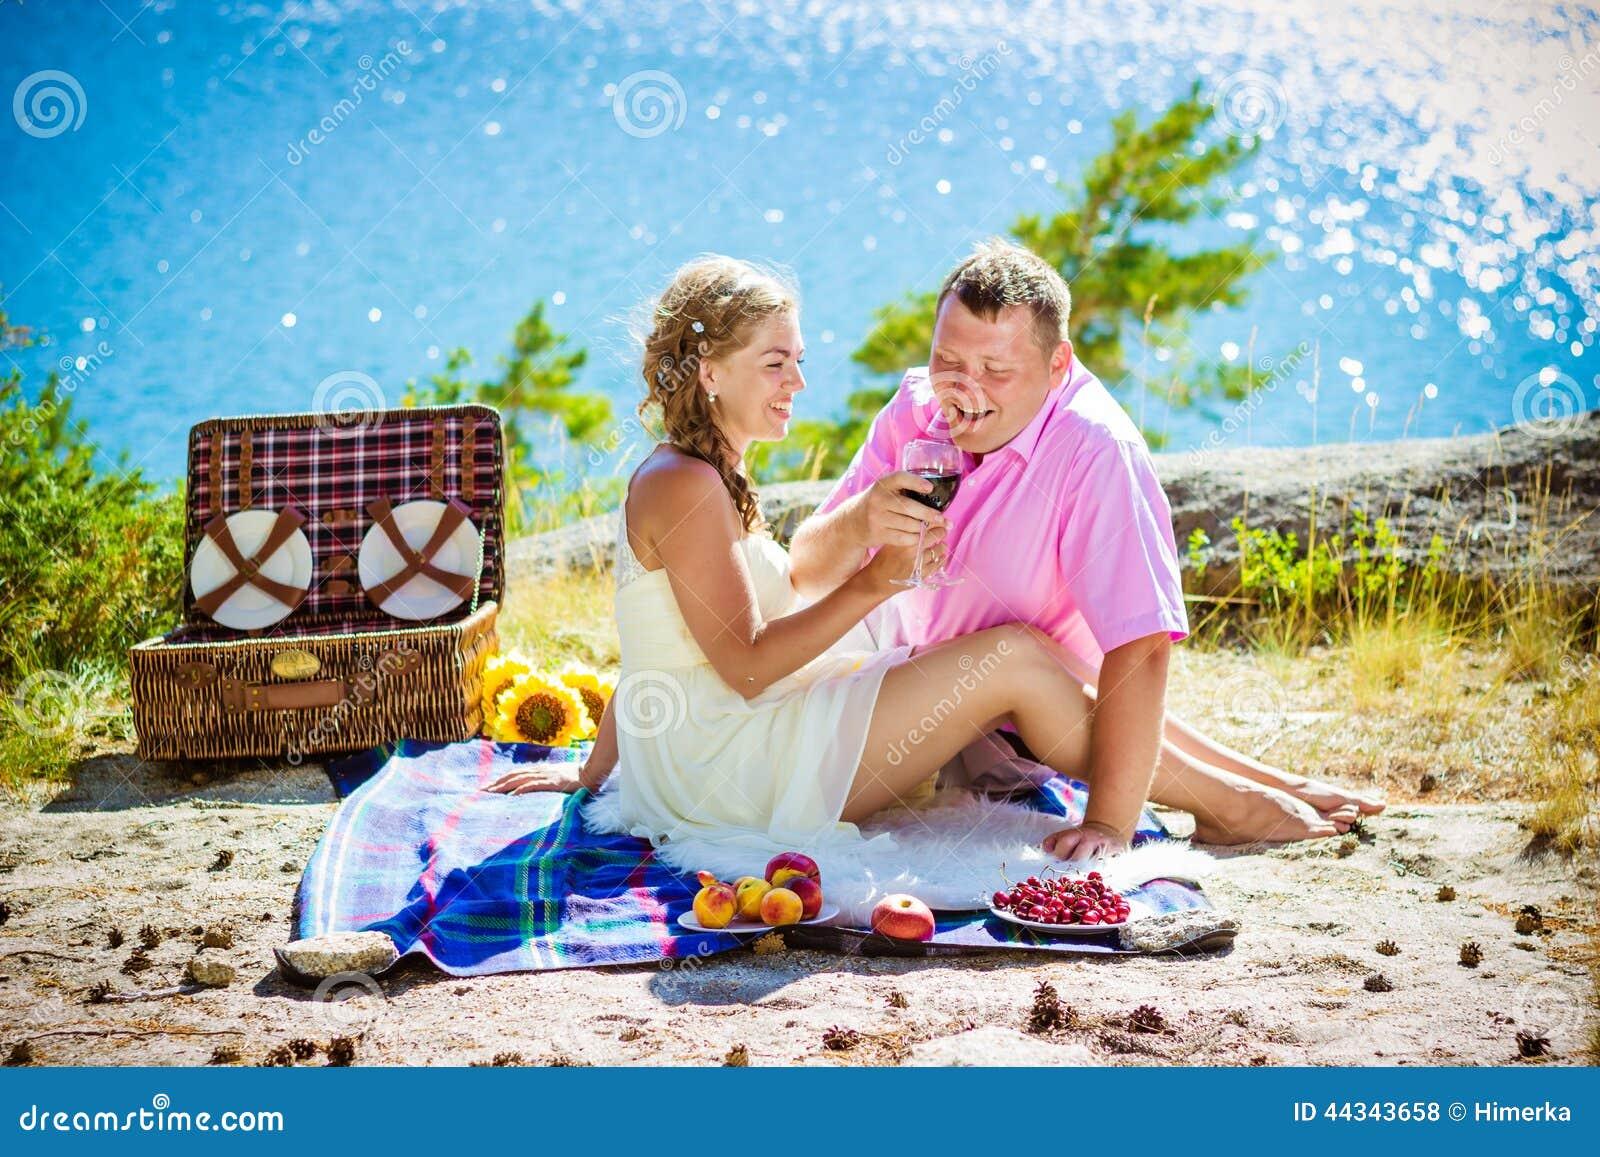 romantisches picknick stockfoto bild 44343658. Black Bedroom Furniture Sets. Home Design Ideas